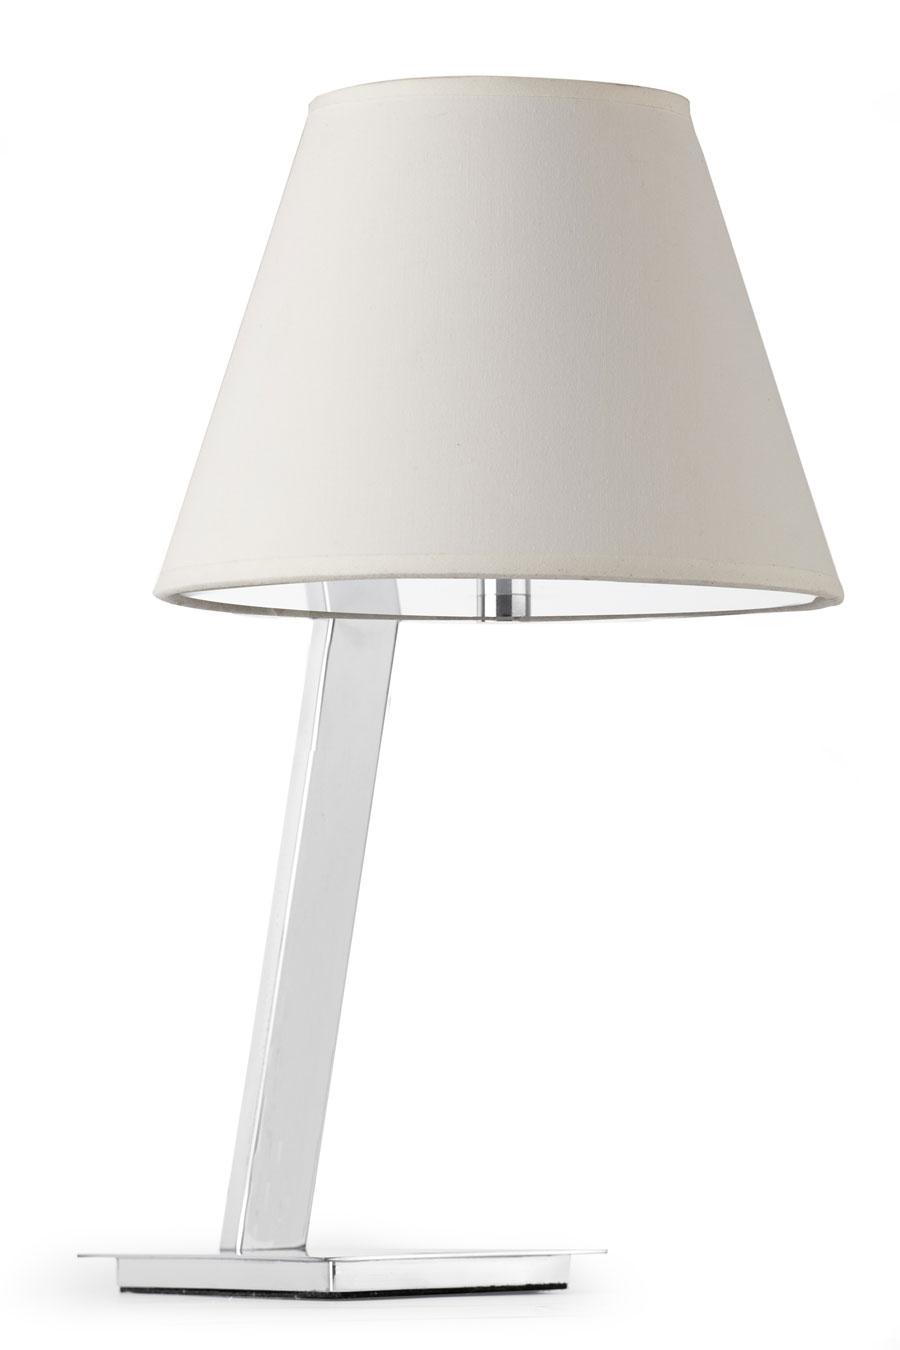 Moma lampe de table design chrome et tissu blanc. Faro.